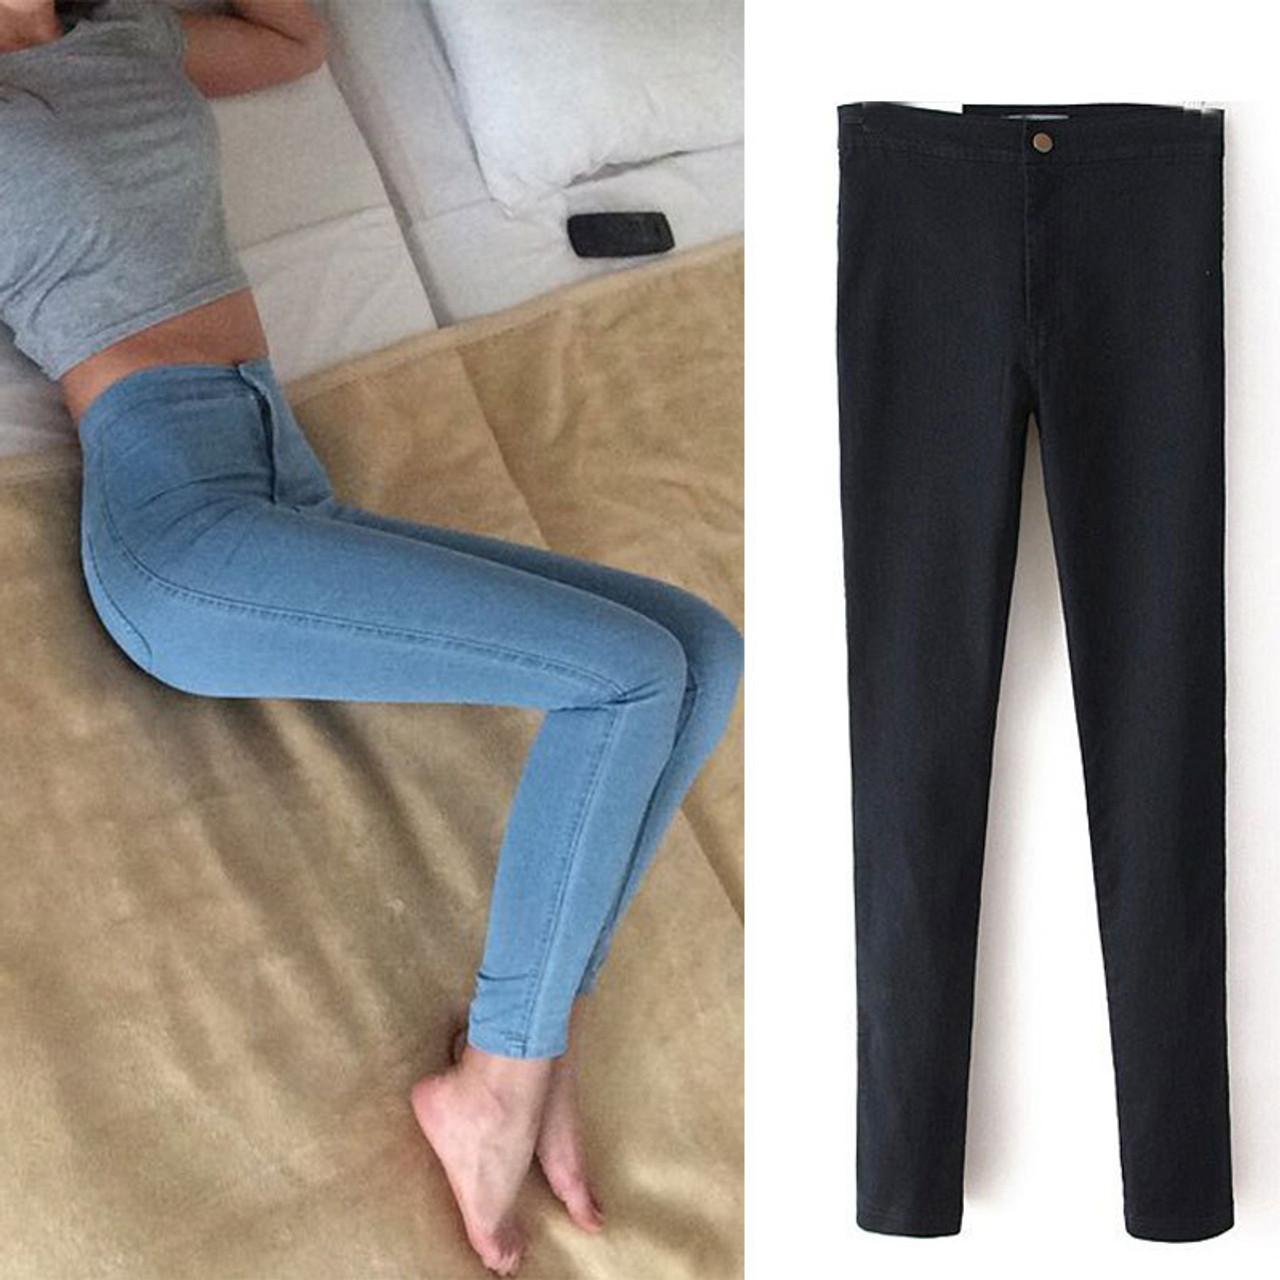 f5ea5949978a3d Eastdamo Slim Jeans For Women Skinny High Waist Jeans Woman Blue Denim  Pencil Pants Stretch Waist ...